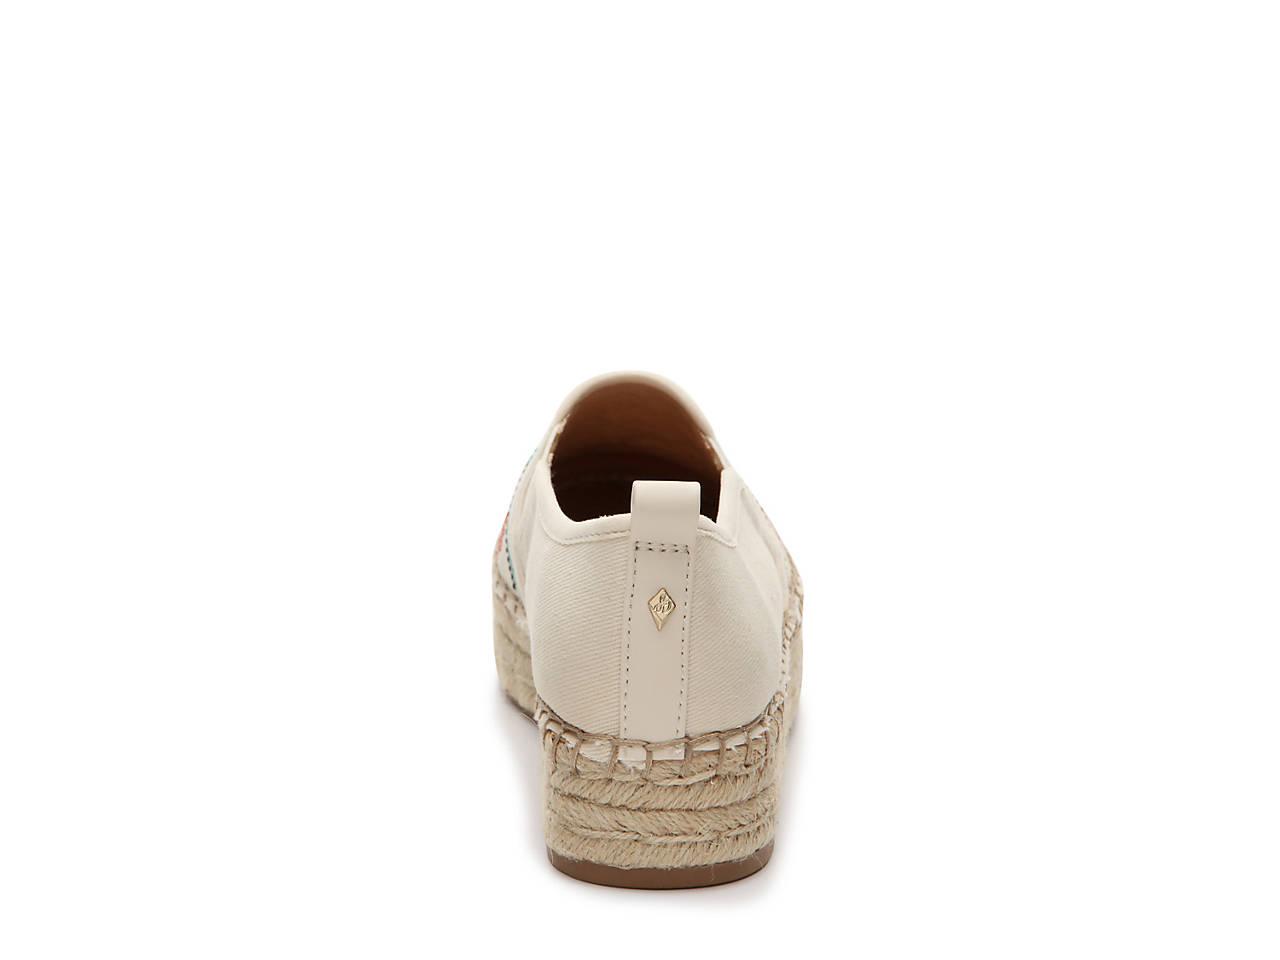 bcfc546aa657 Sam Edelman Carrin Espadrille Platform Slip-On Women s Shoes